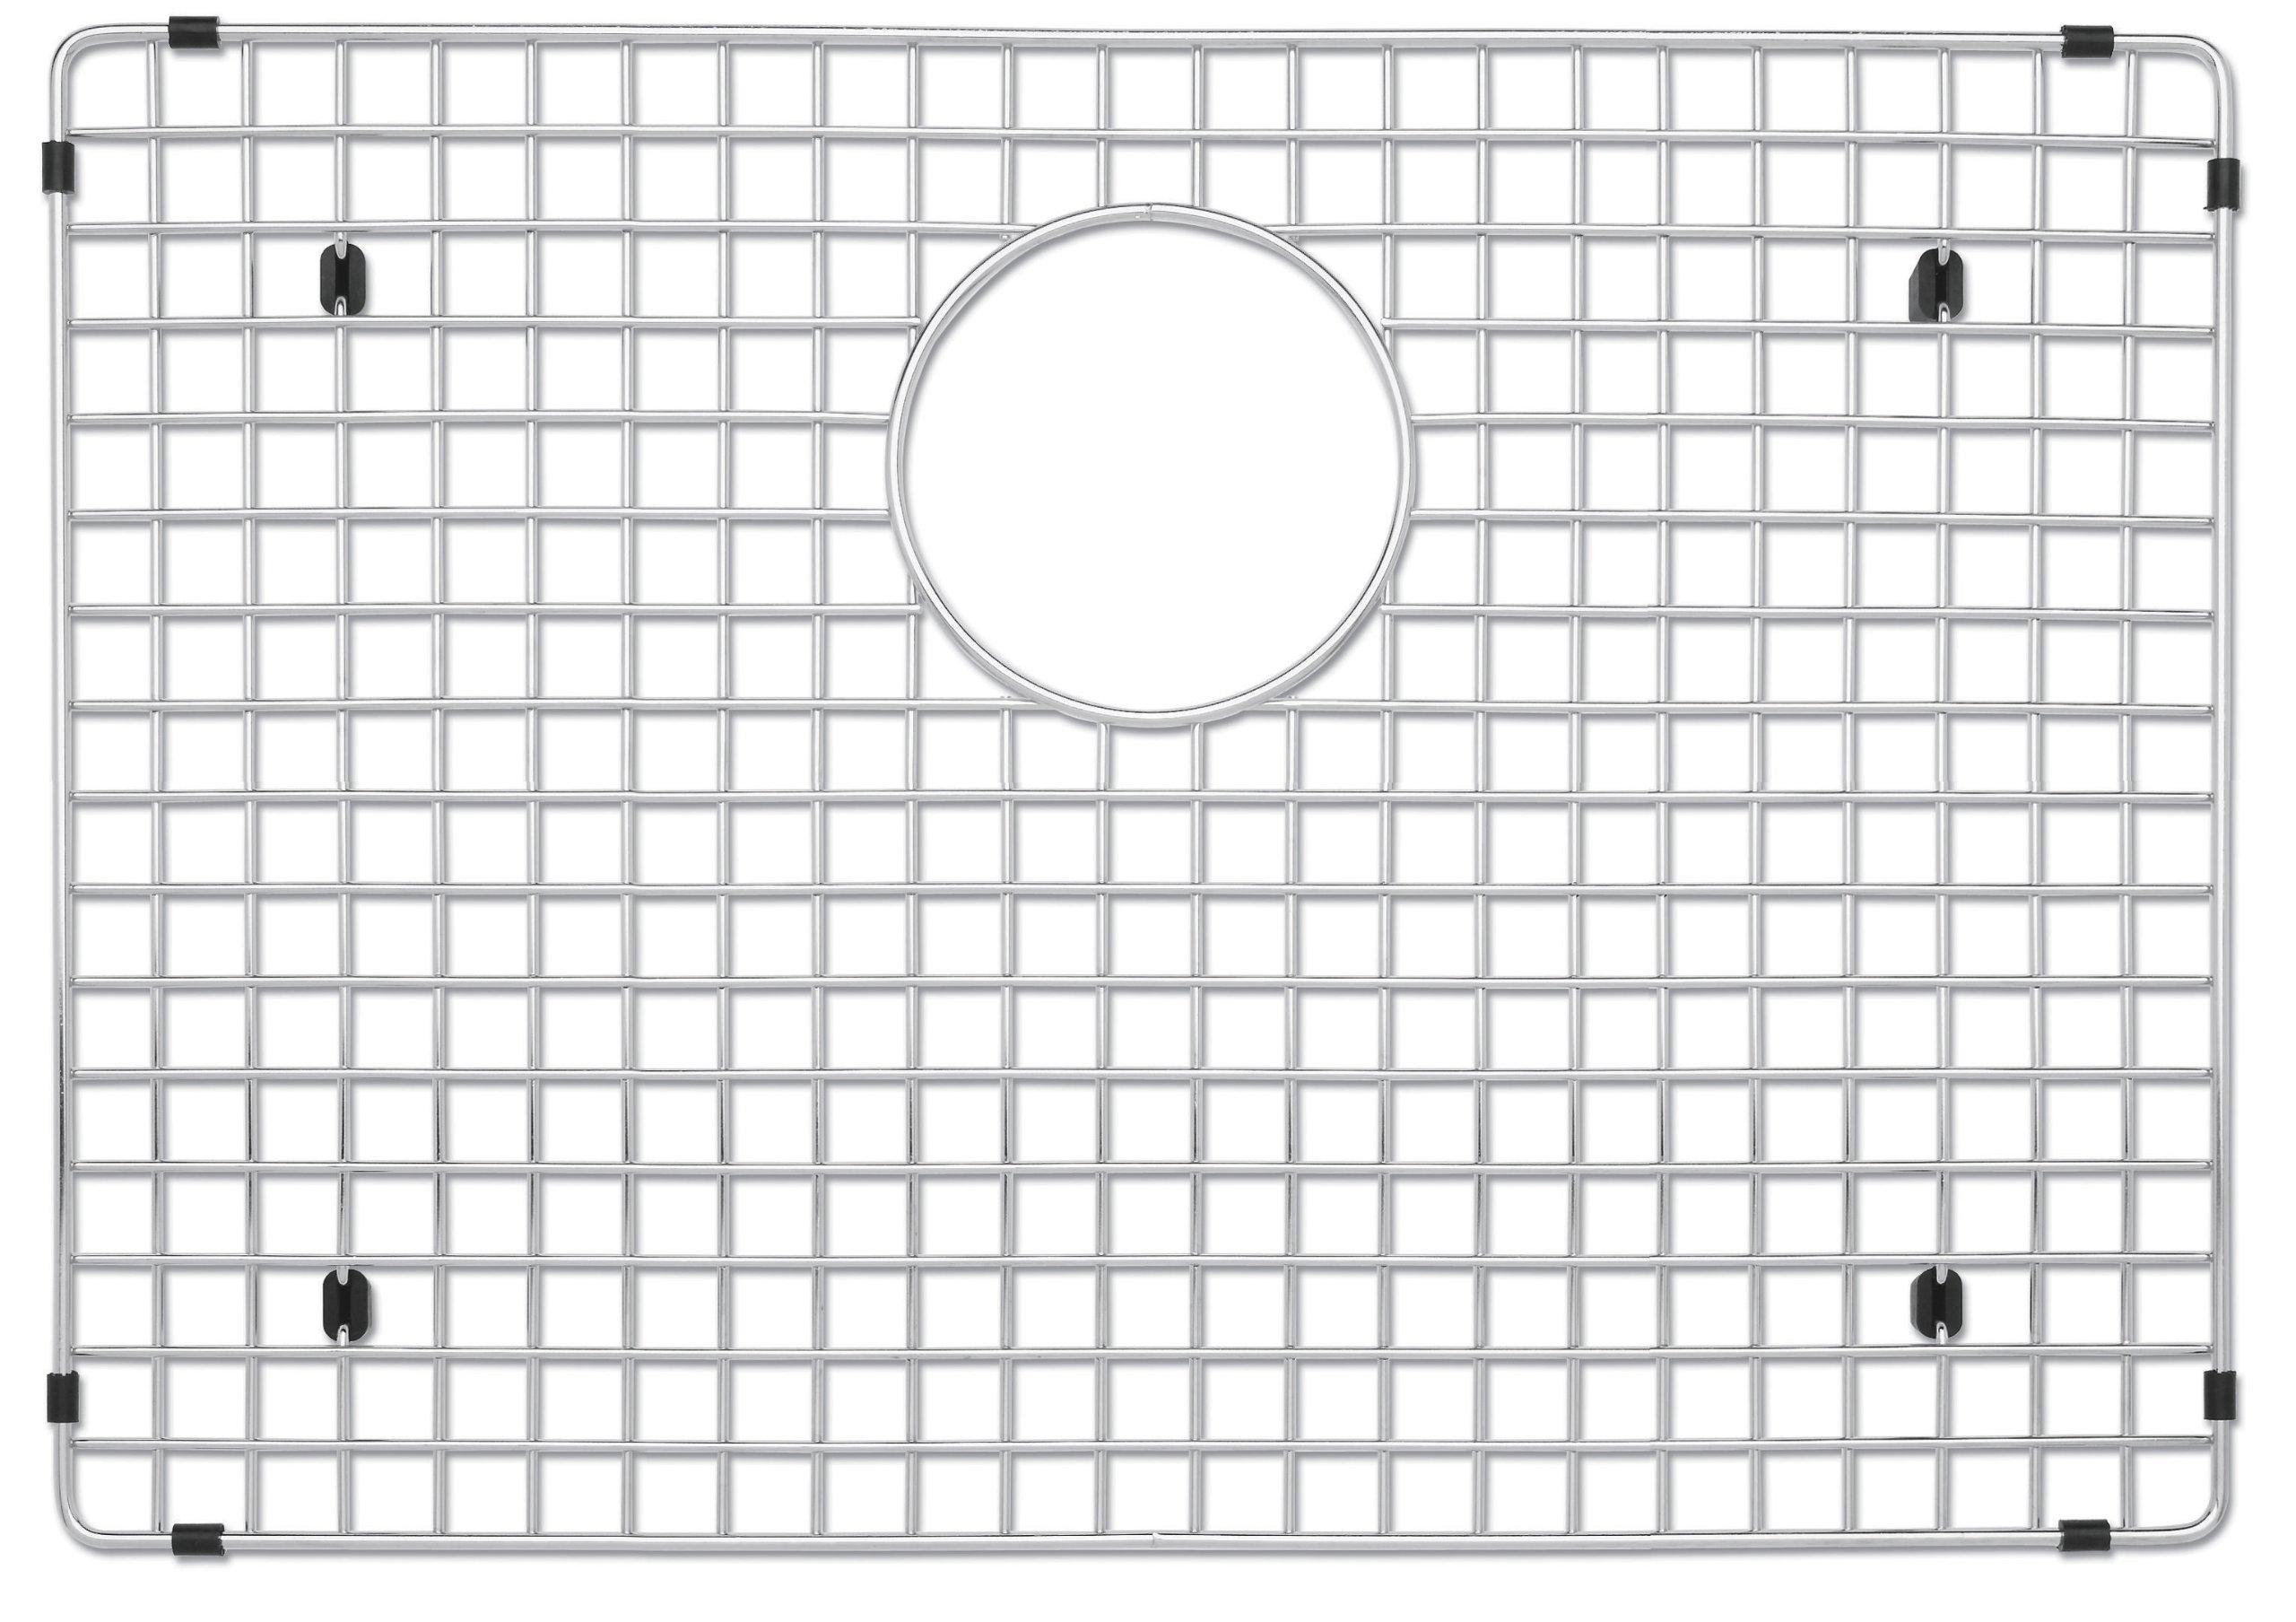 Blanco 223191 Stainless Steel Sink Grid, Fits Precision and Precision 10 sinks 515822/819, Stainless Steel